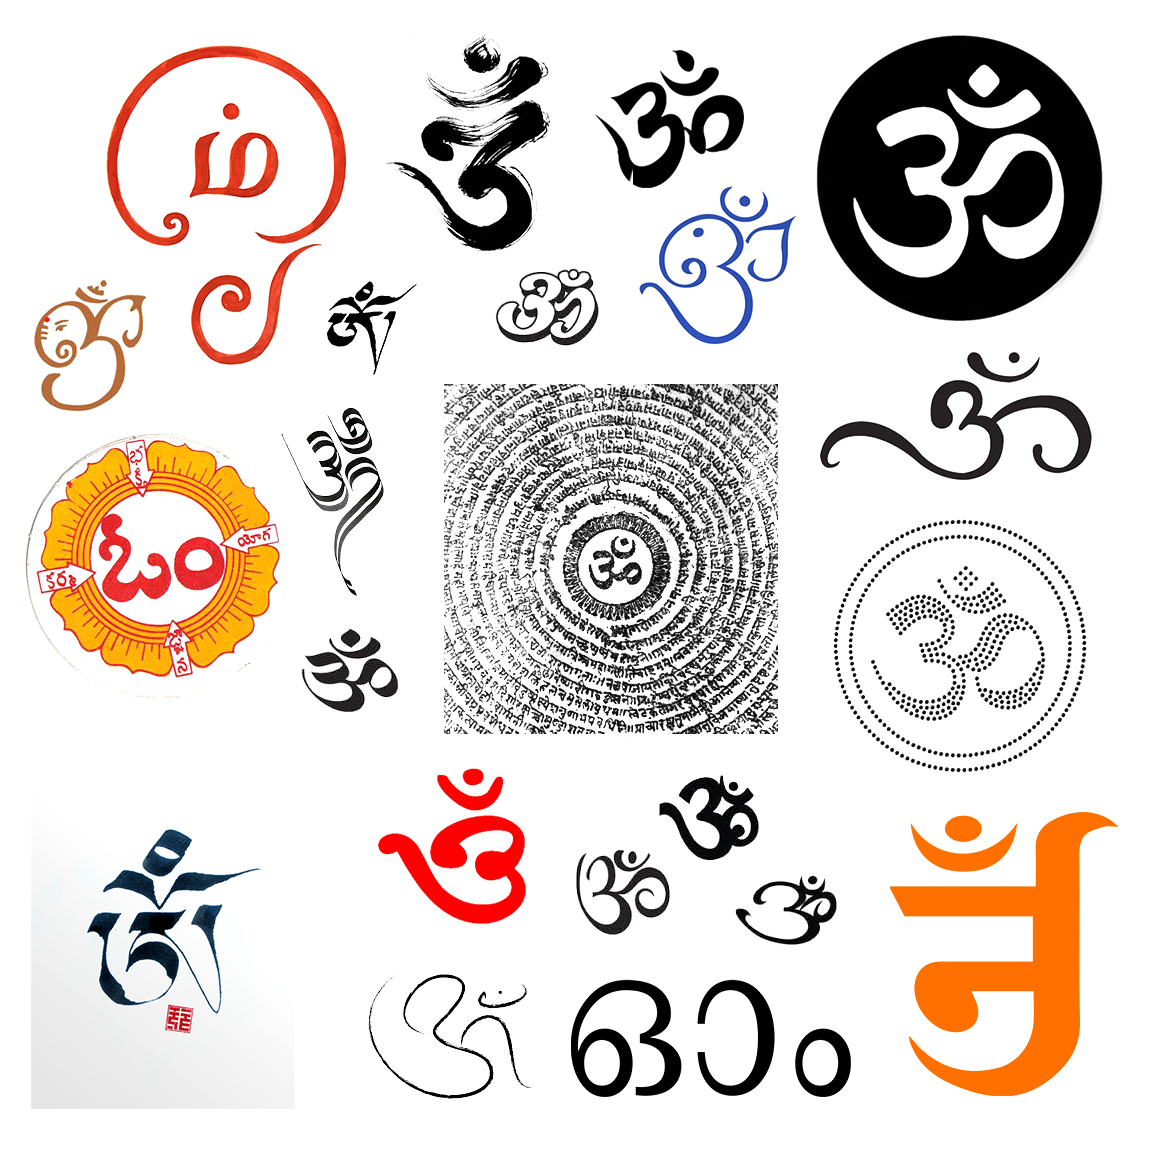 Om Symbols Font Aid Viii Hindi Rinny